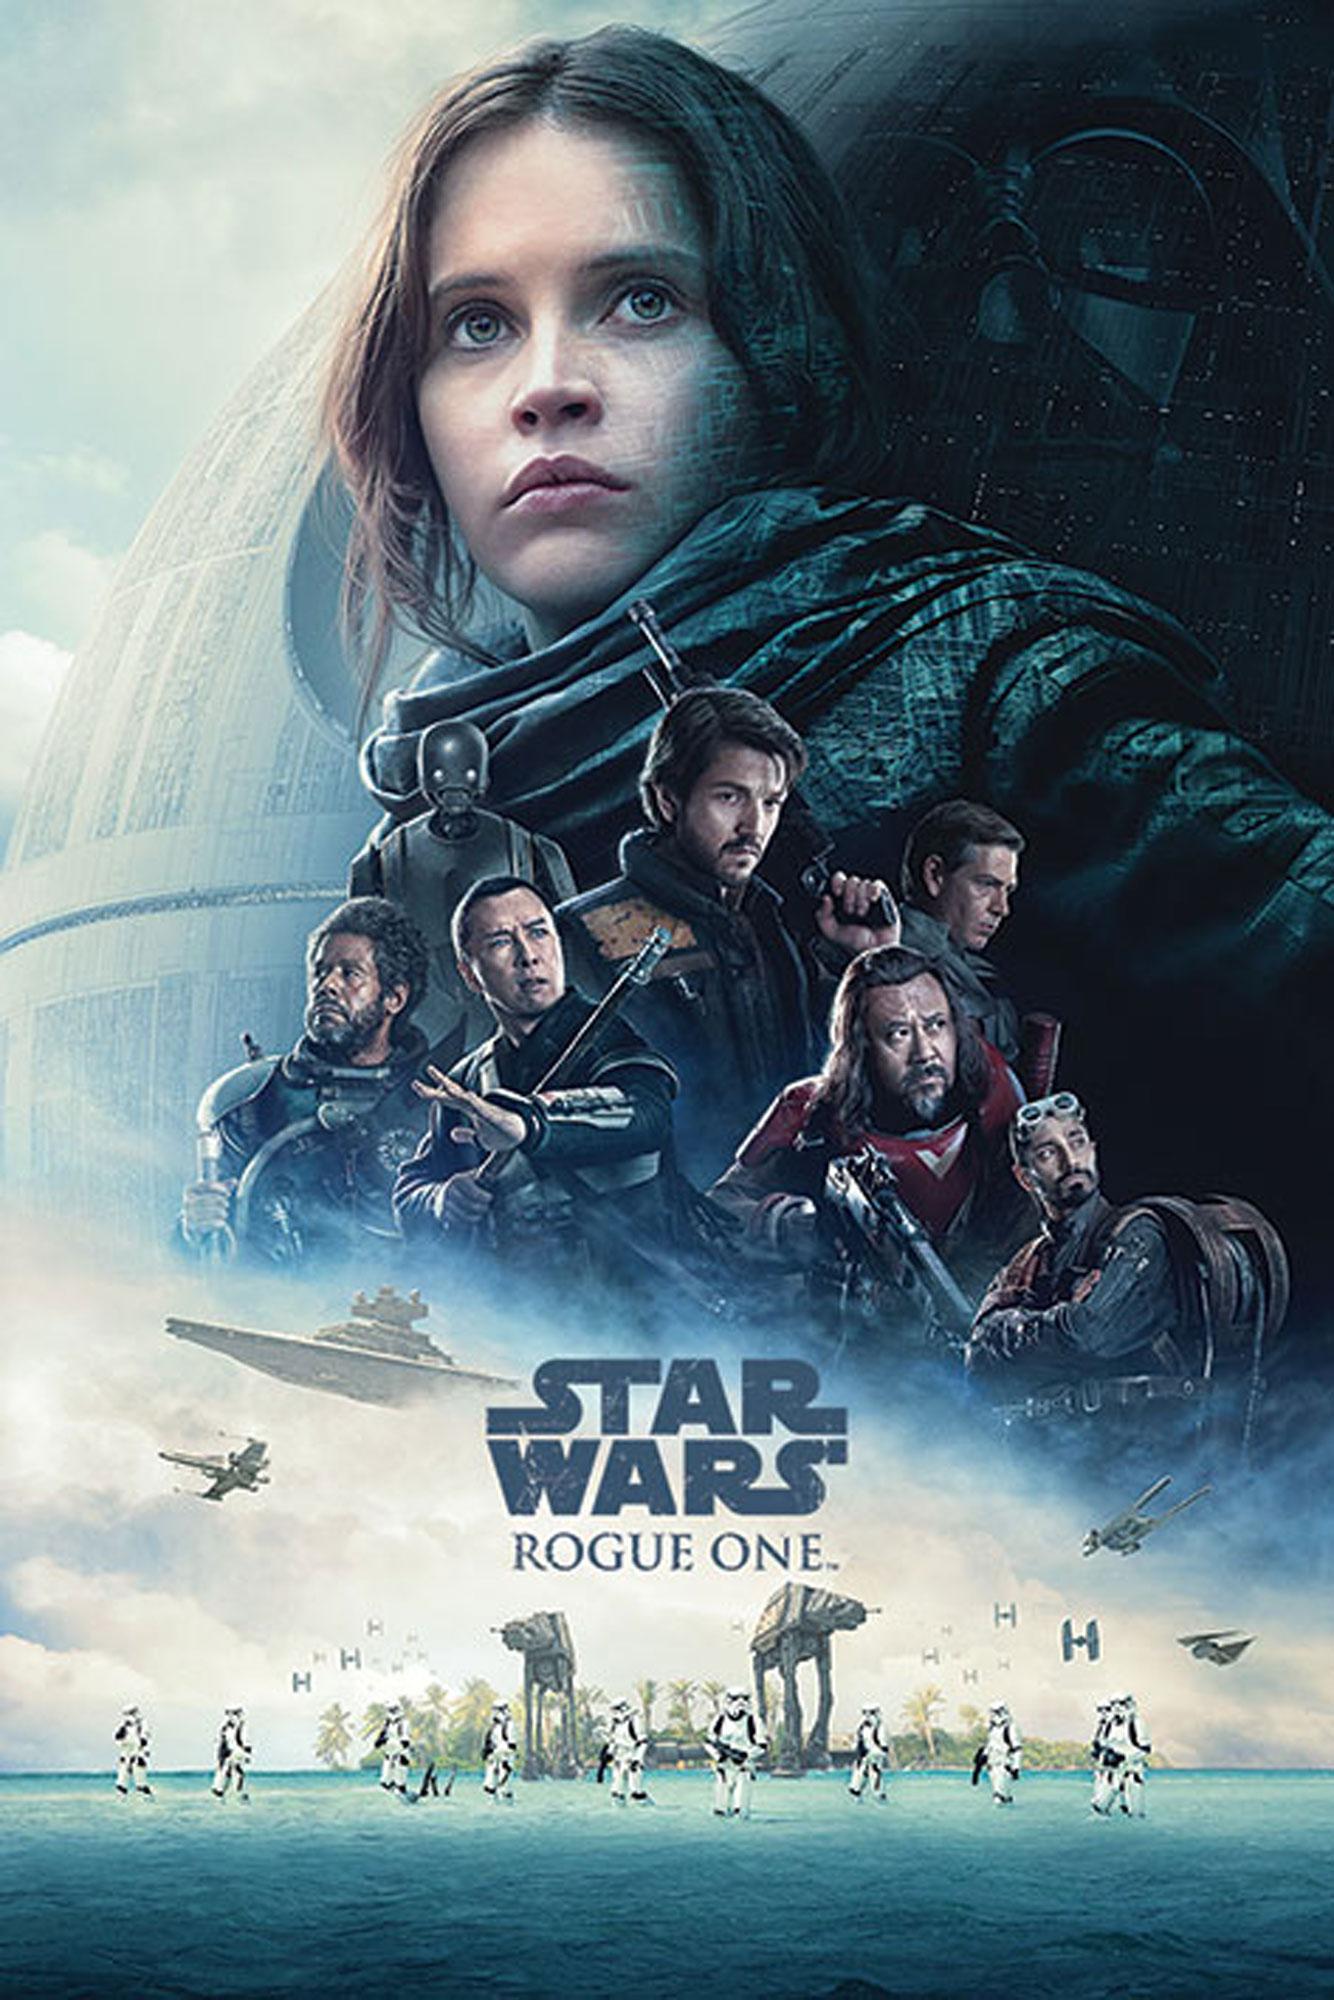 Star Wars - Rogue One - One Sheet - Poster Plakat Druck - Größe ...